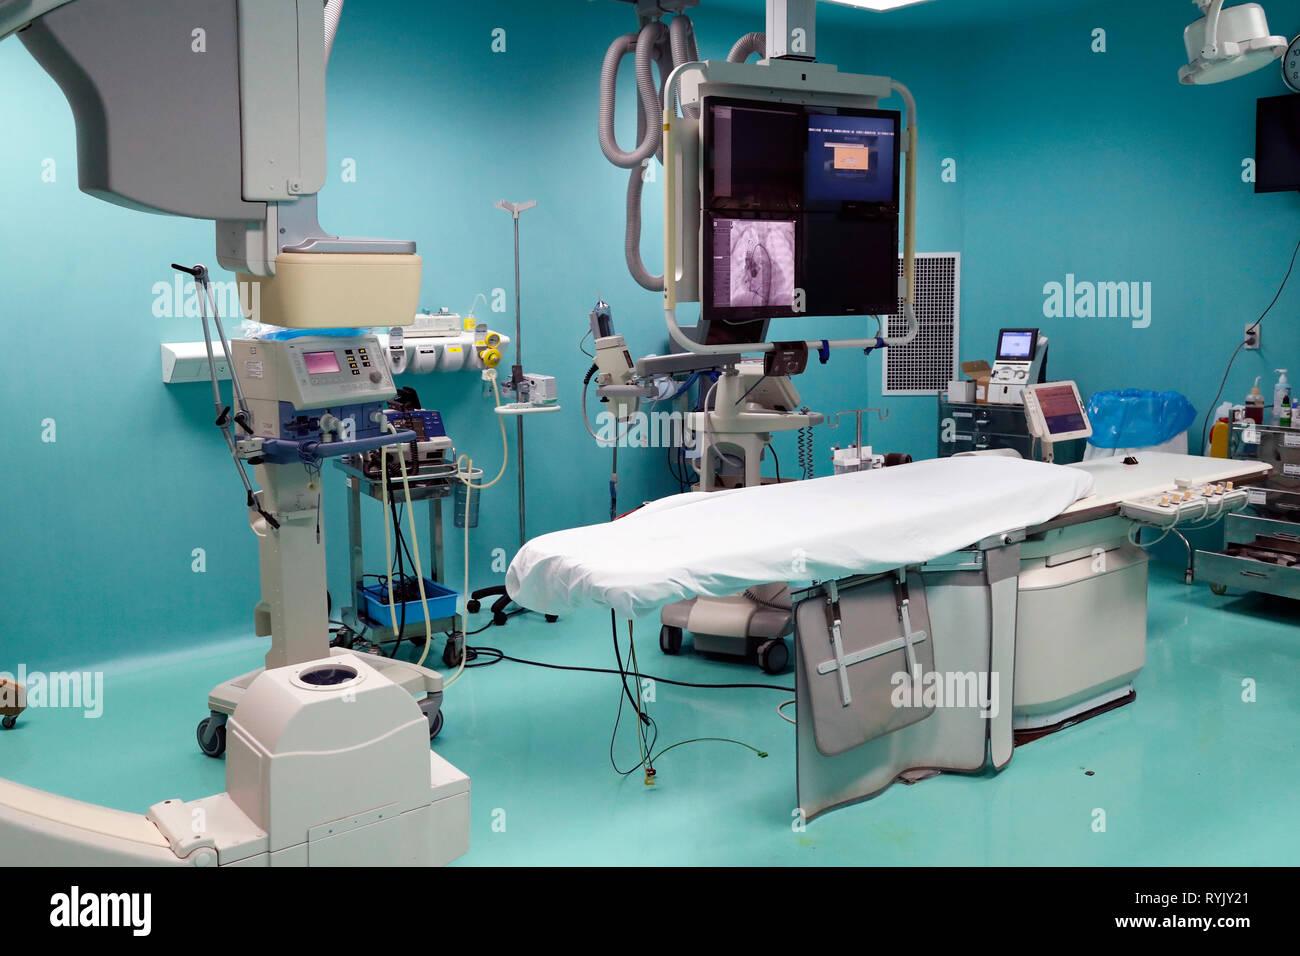 Tam Duc Cardiology Hospital. Diagnostic radiology. Angiography. Ho Chi Minh City. Vietnam. - Stock Image